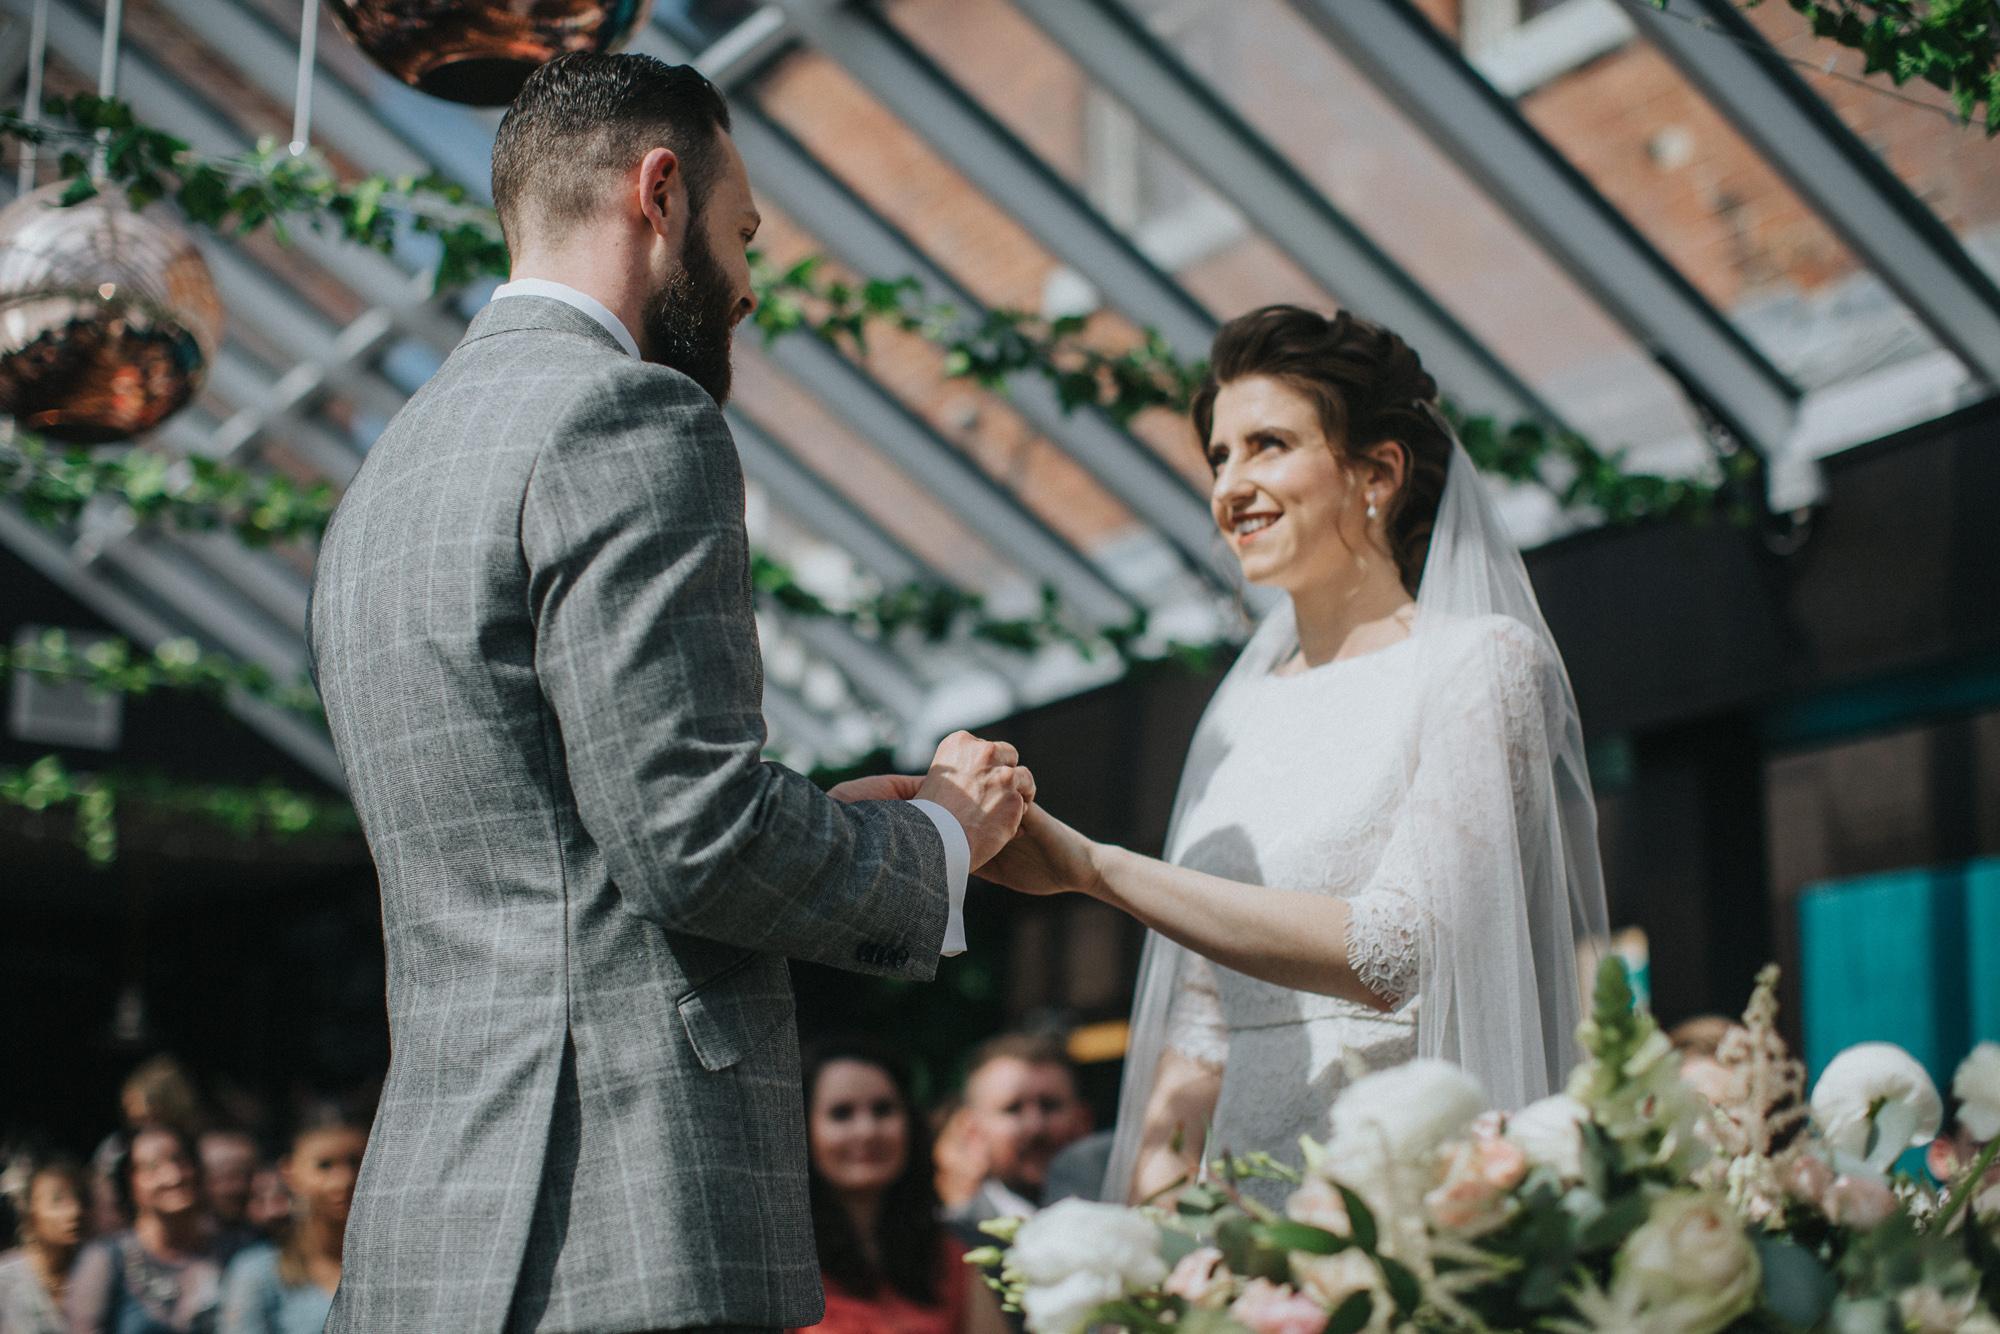 Kate-Beaumont-Lace-Flared-Dahlia-Gown-Leeds-Wedding-Bloom-Weddings-22.jpg